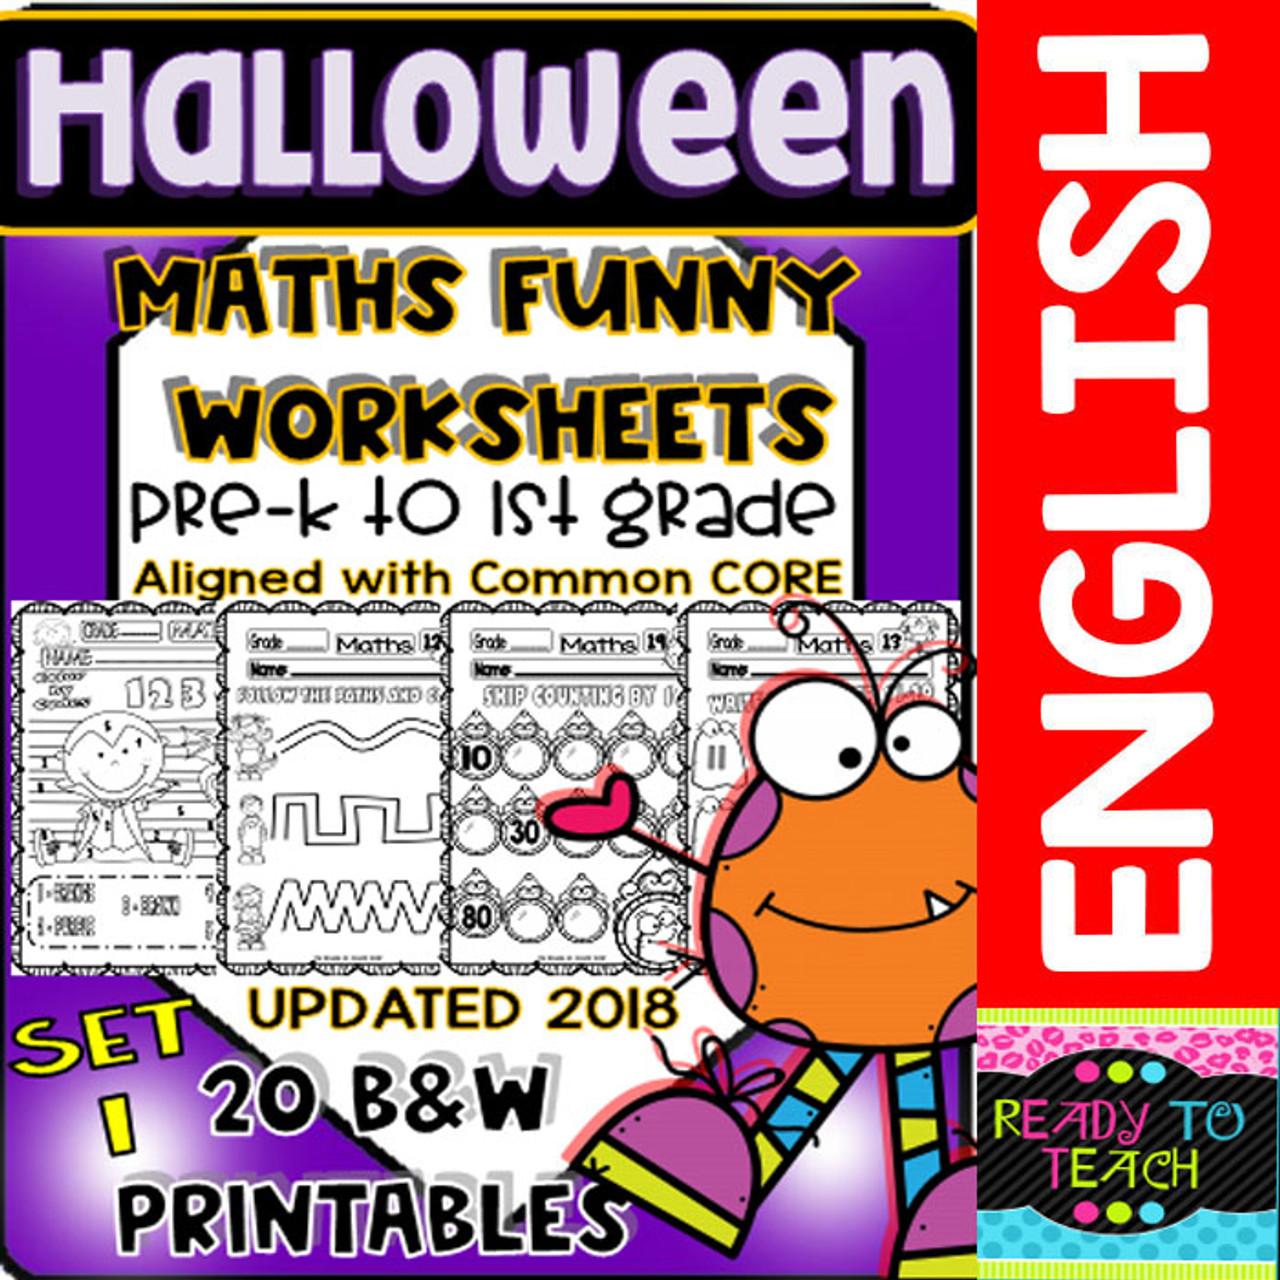 medium resolution of Halloween Maths Funny Worksheets - 20 B\u0026W Printables - Set 1 - Amped Up  Learning